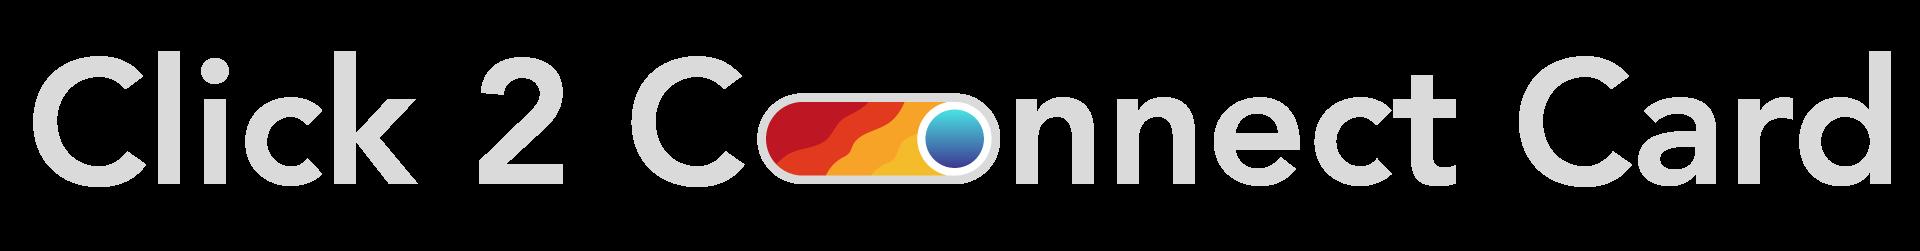 Header | Logo designer in Coimbatore